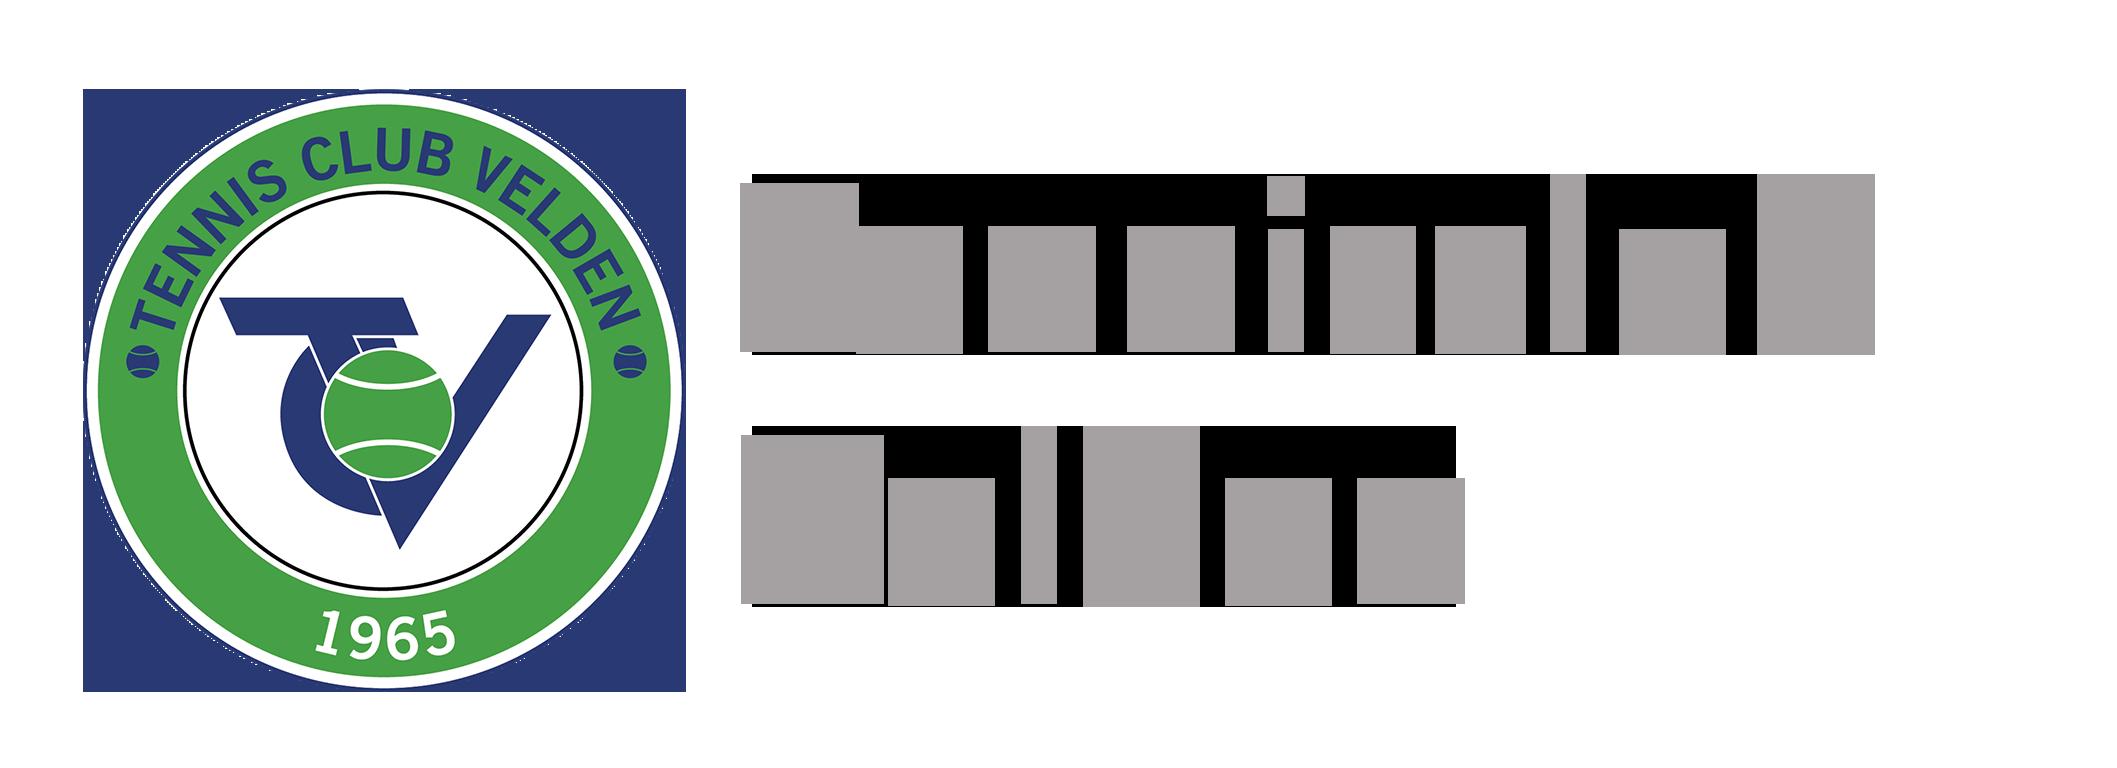 Tennisclub Velden